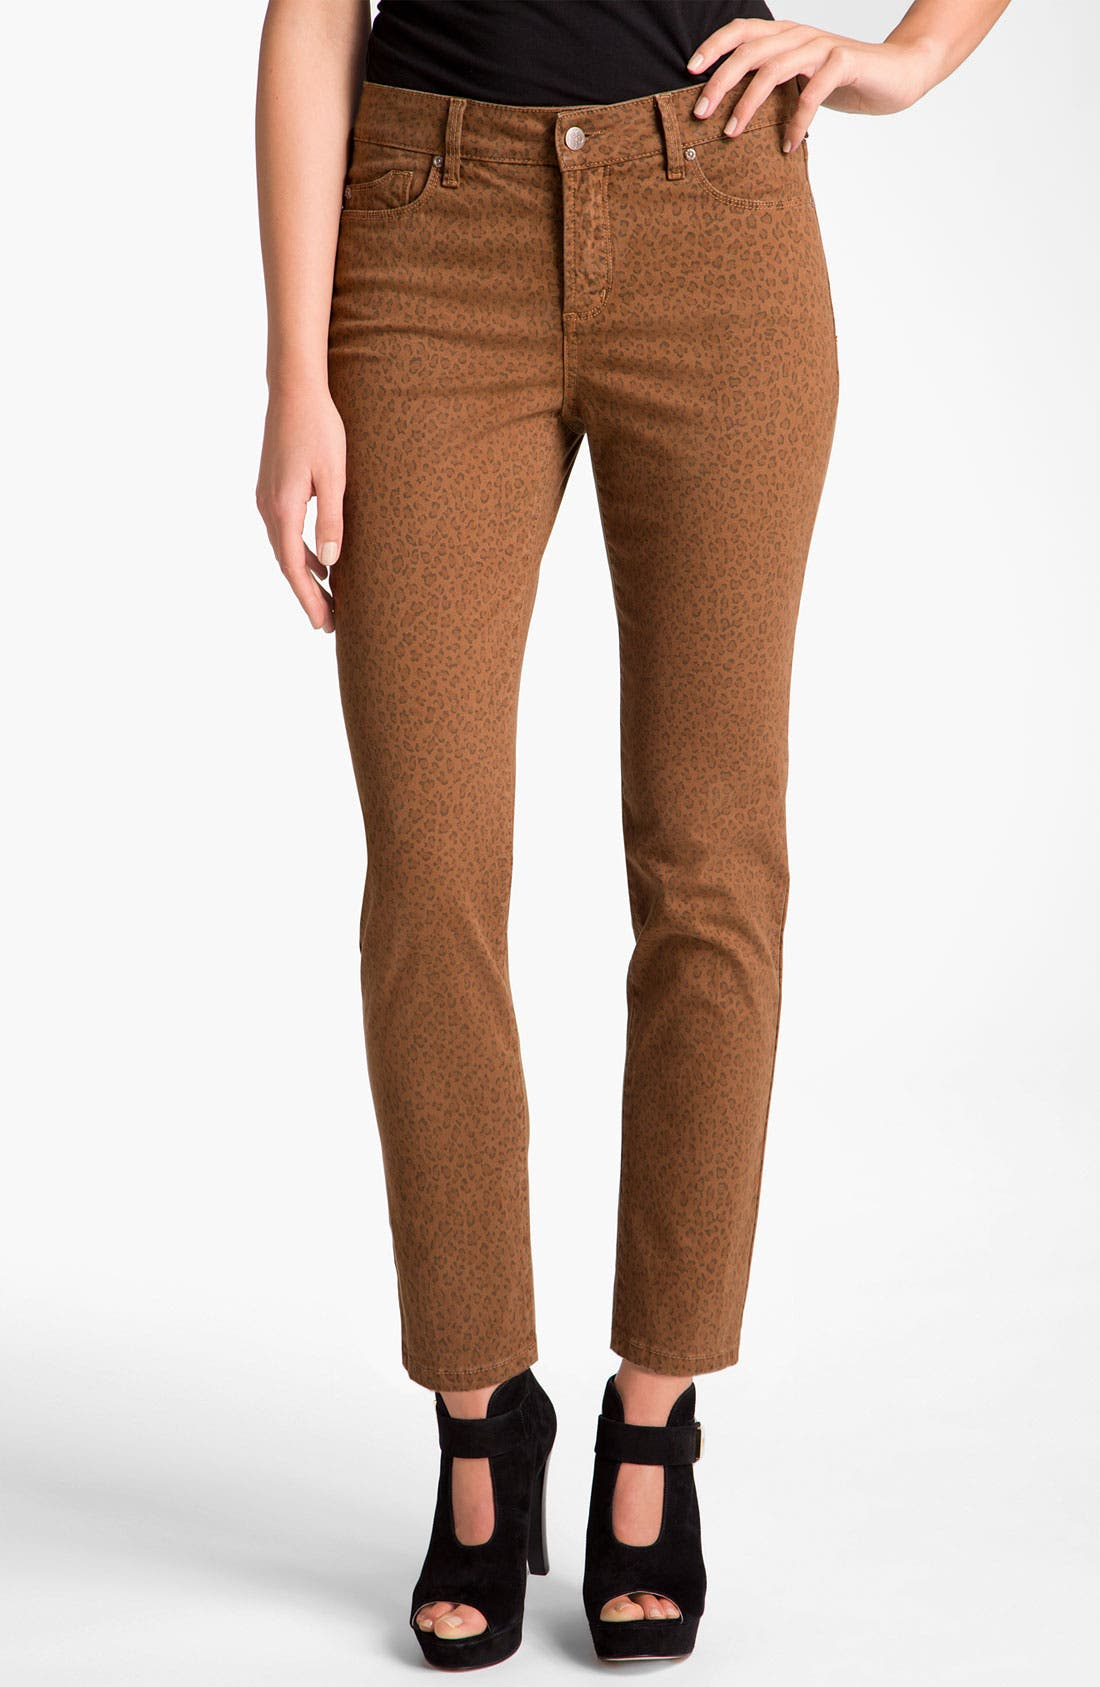 Alternate Image 2  - NYDJ 'Alisha' Leopard Print Twill Ankle Jeans